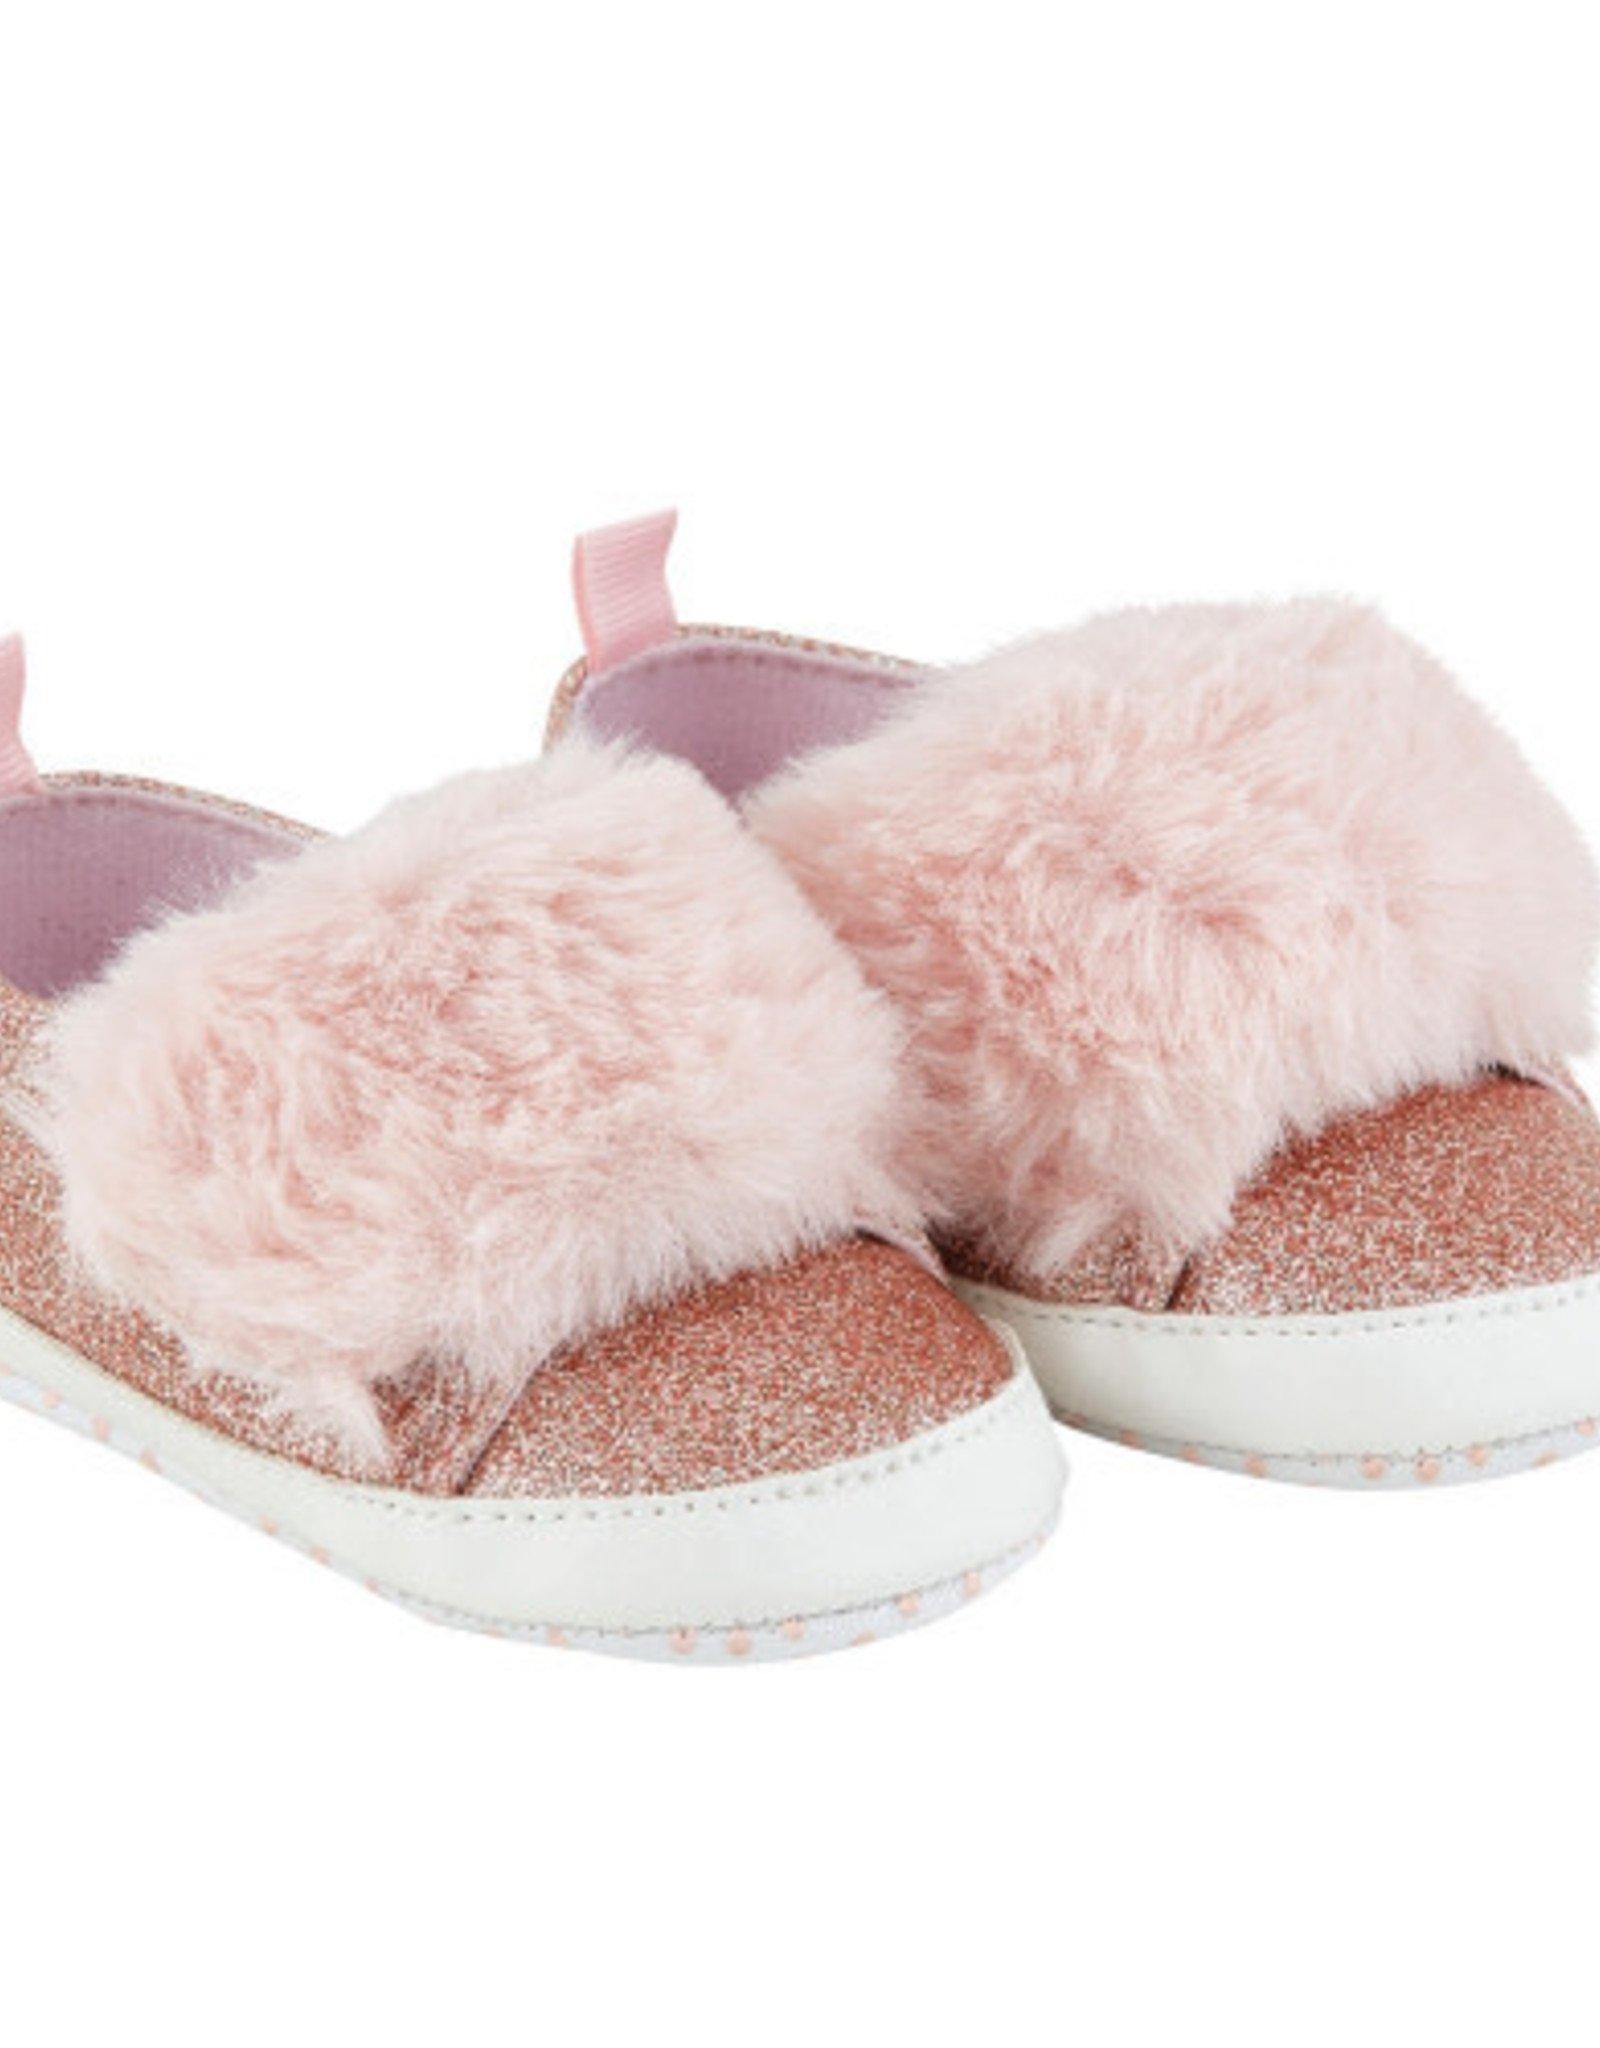 Creative Brands Pink Fur Shoe 6 - 12 month